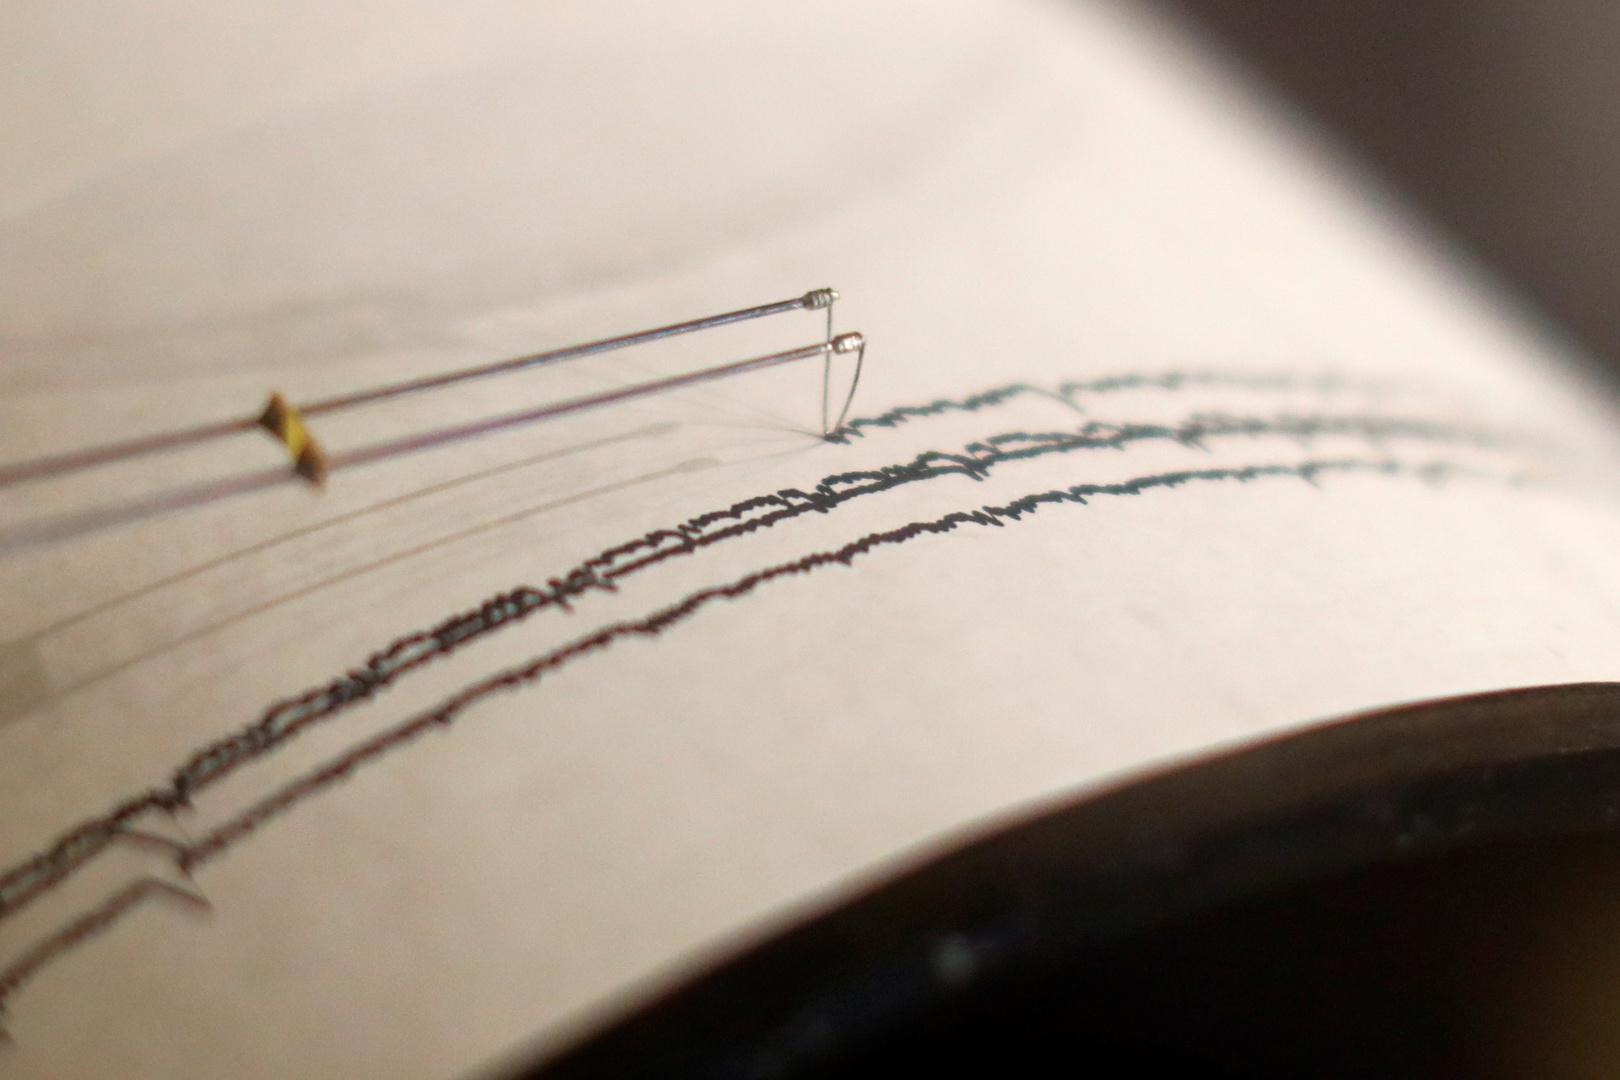 جهاز رصد الزلازل